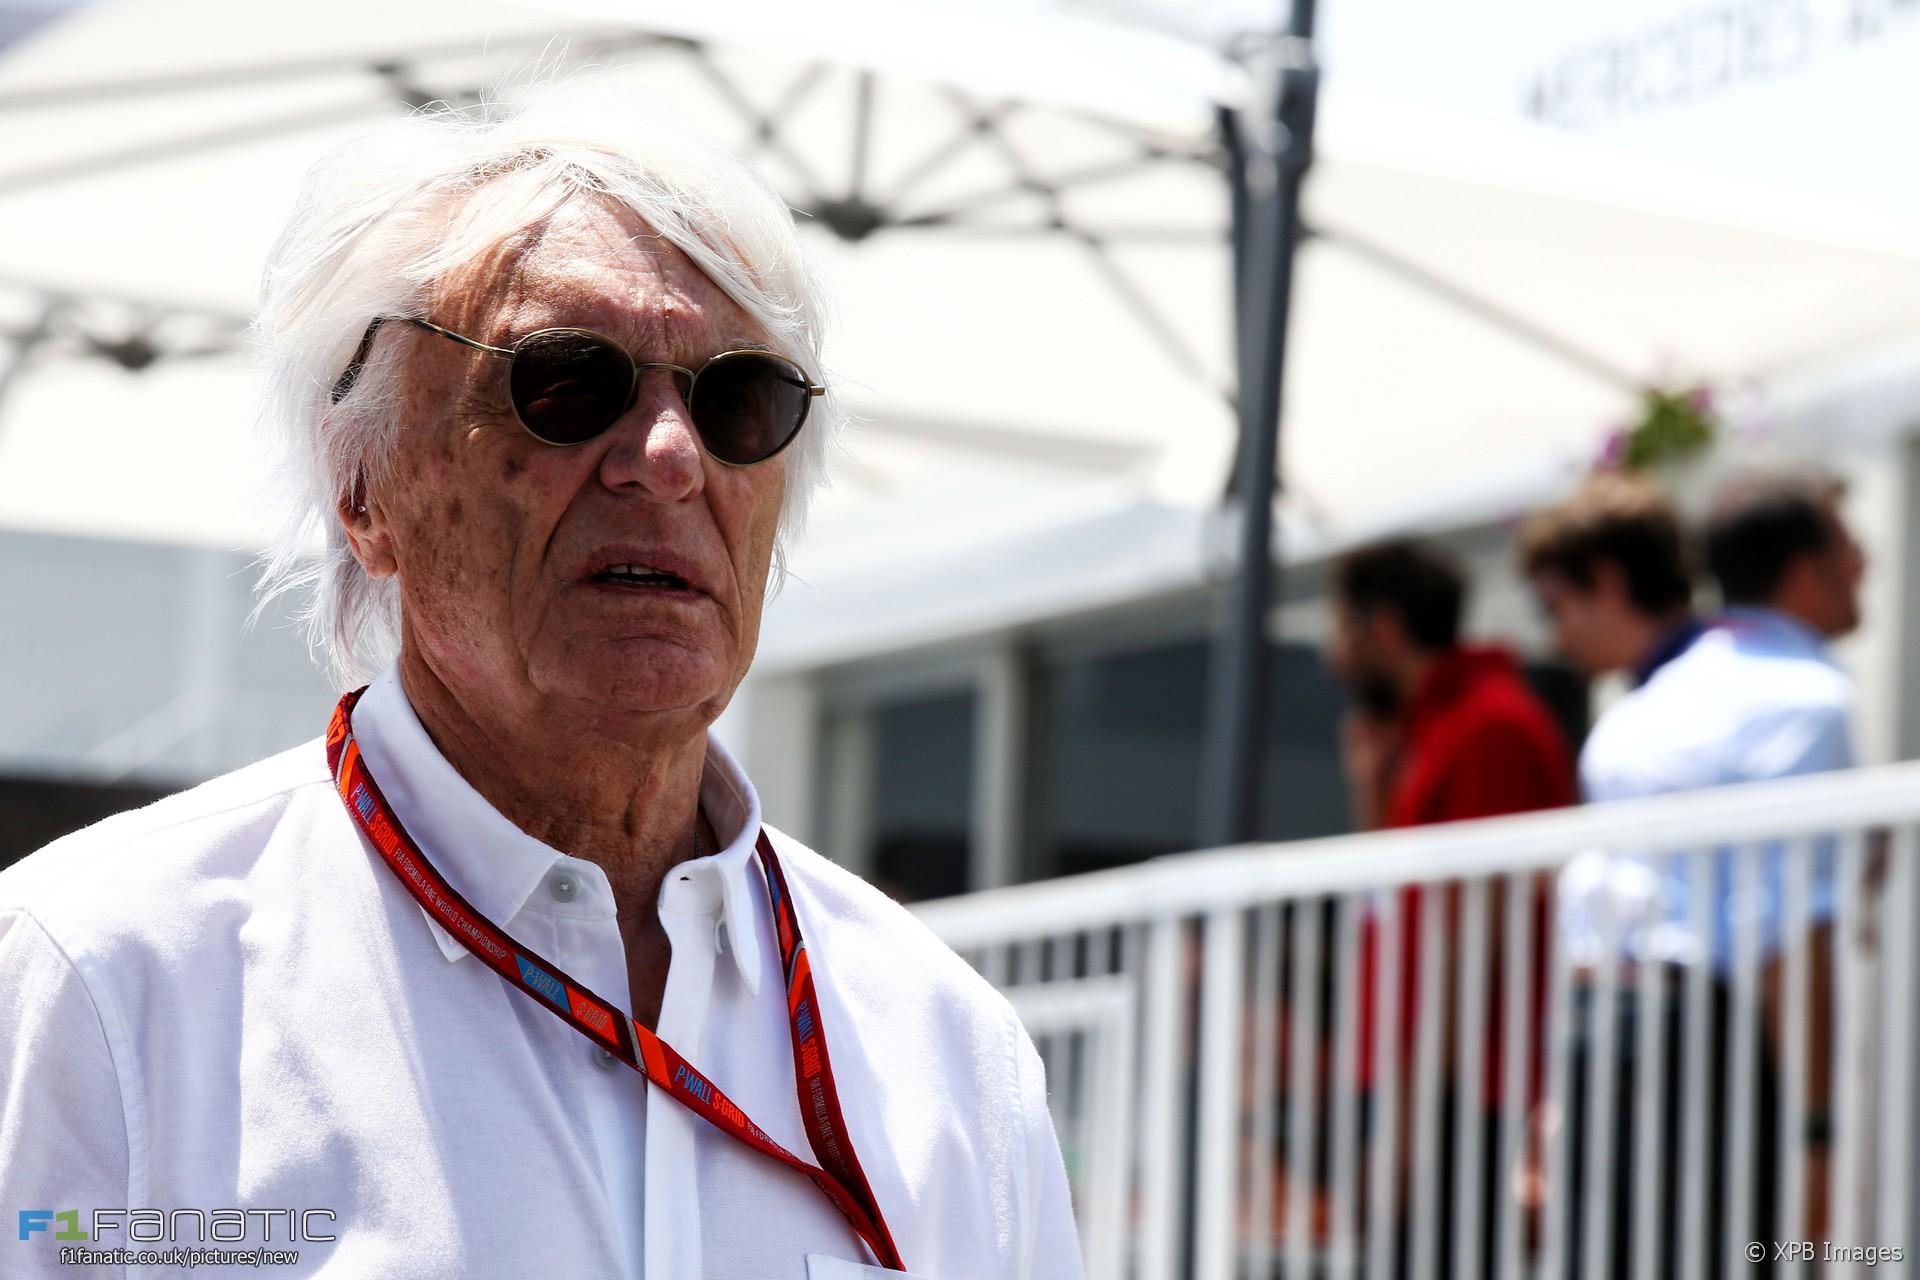 Bernie Ecclestone, Baku City Circuit, 2017